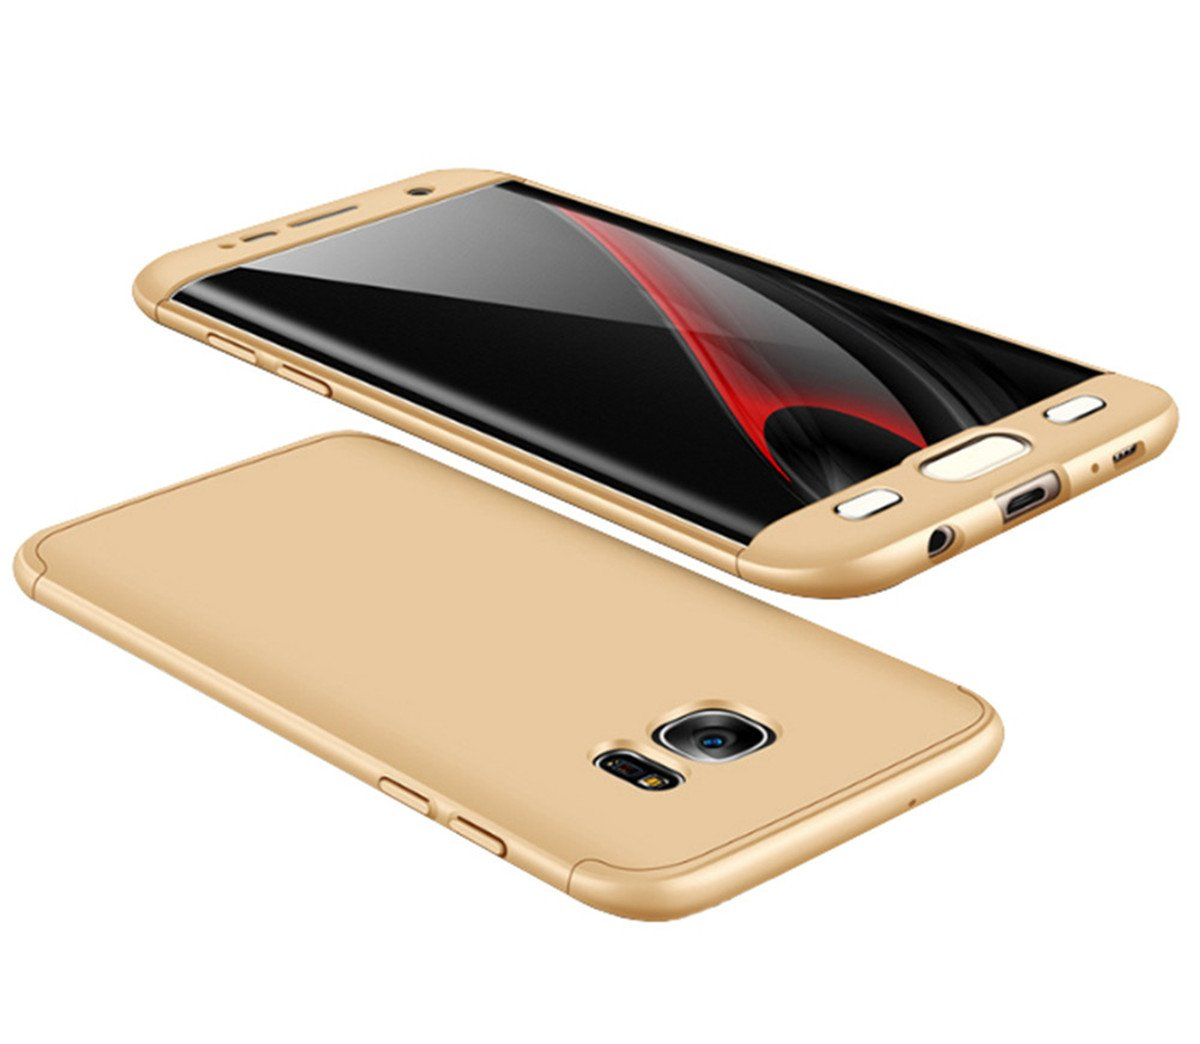 7abb0320645 Funda Samsung Galaxy s7/s7 Edge Biter Cubierta de 360°Caja Protectora PC  Shell Duro A Prueba de choques Almohadilla Anti-rasguño del Protector 3 en  1 ...